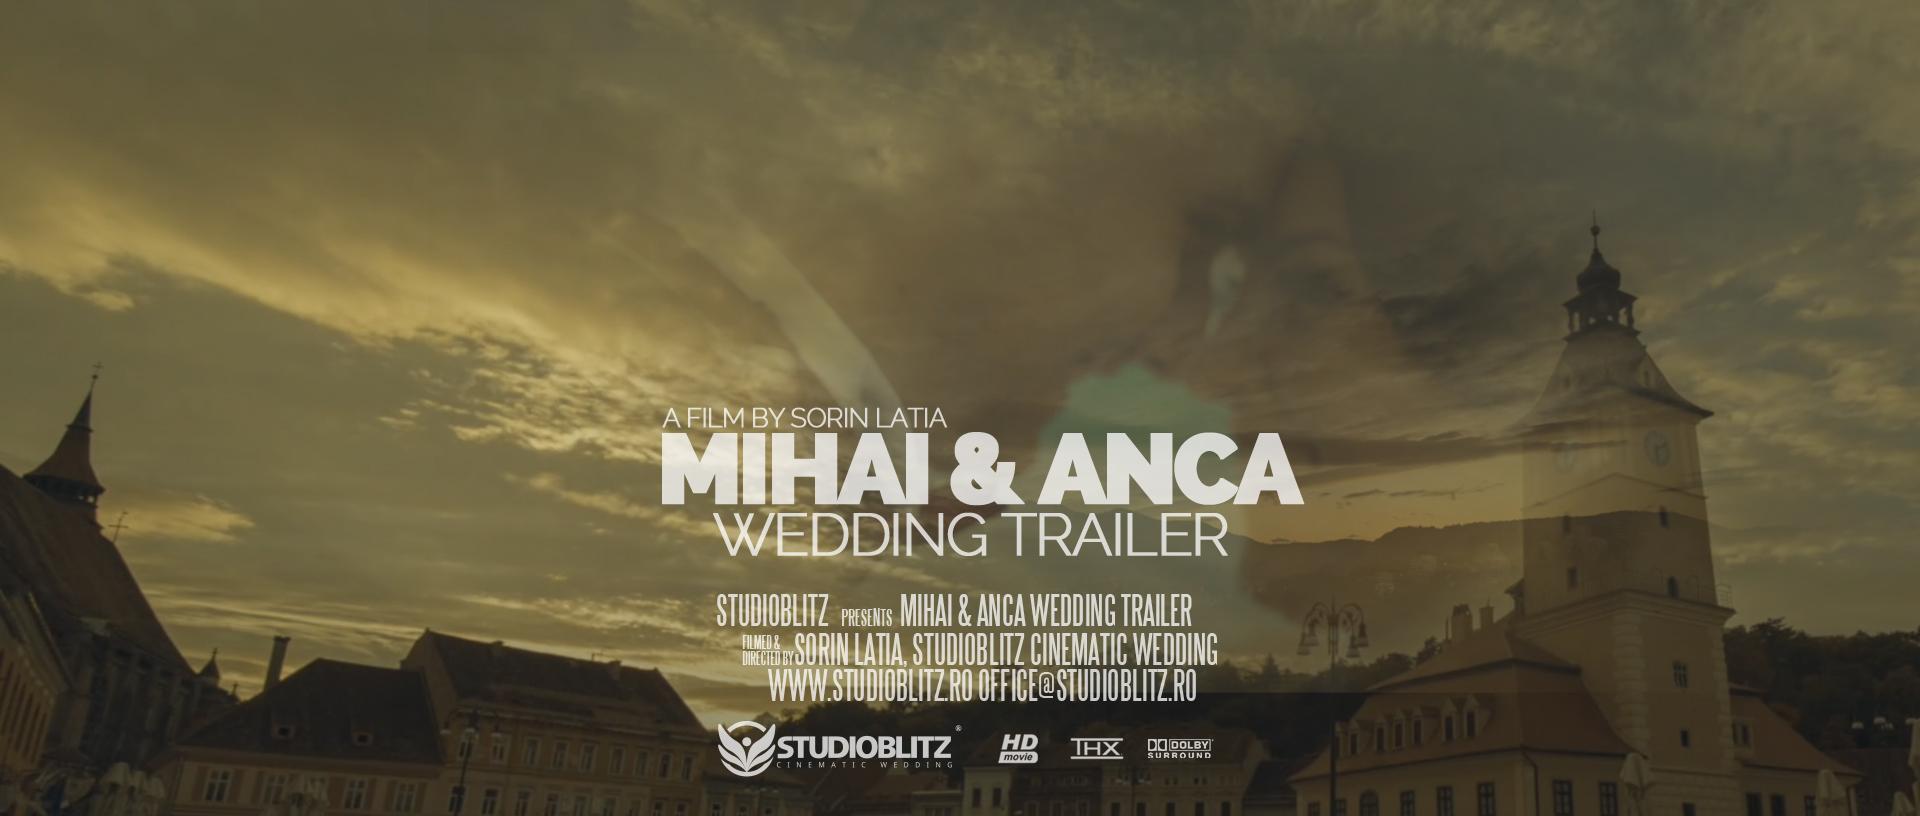 coperta-filmari-nunti-brasov-mihai-anca-wedding-trailer1